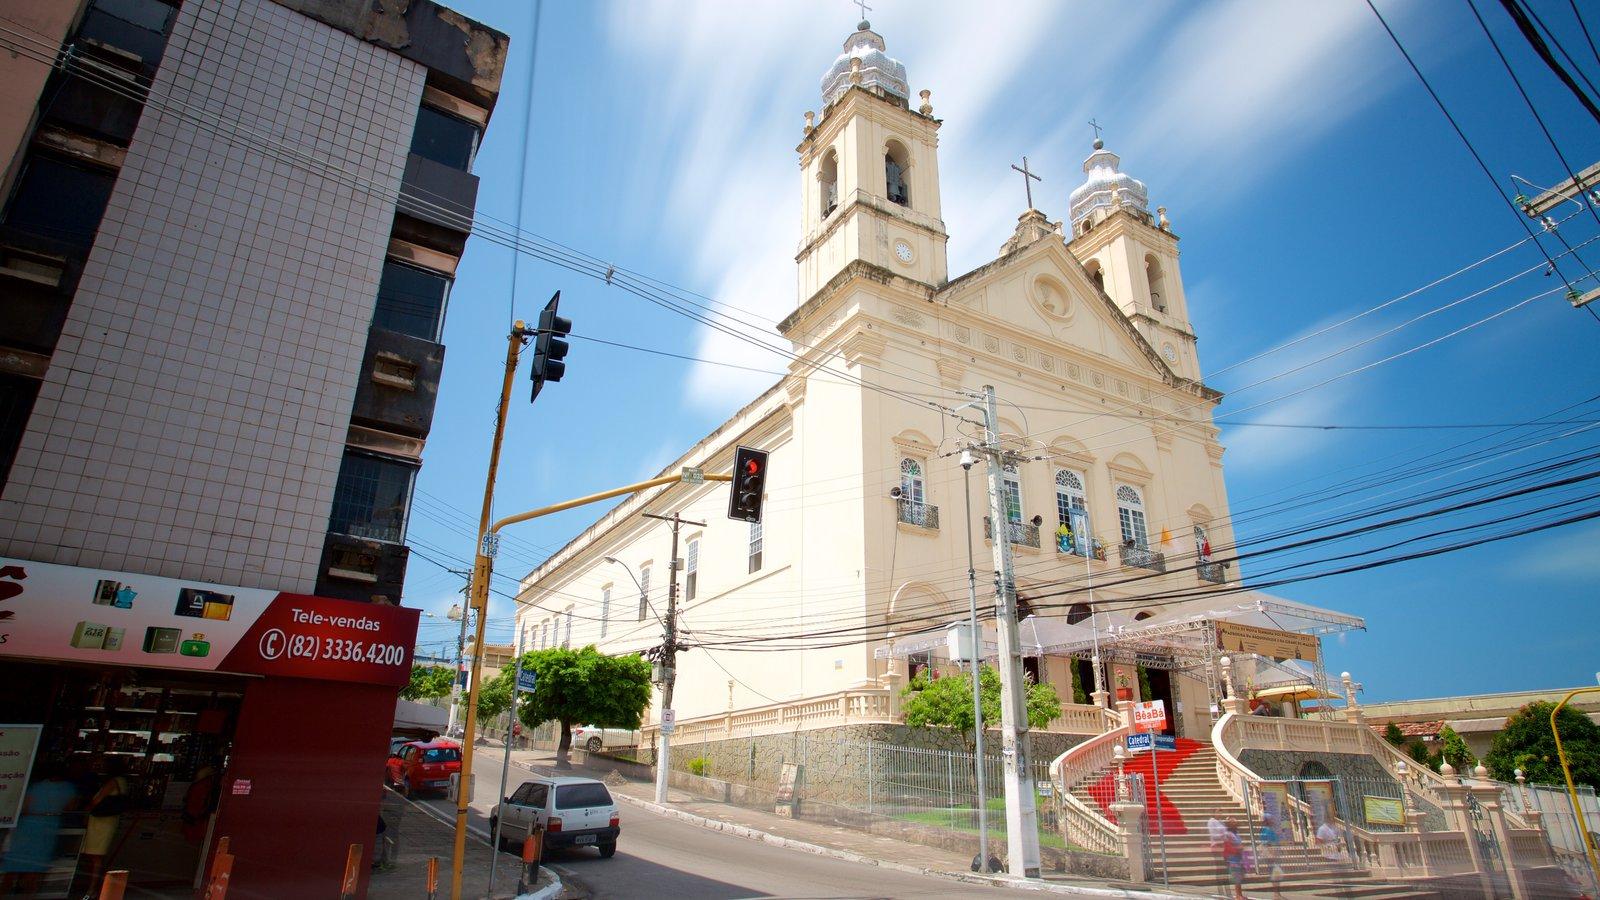 Catedral Metropolitana de Maceió caracterizando uma igreja ou catedral